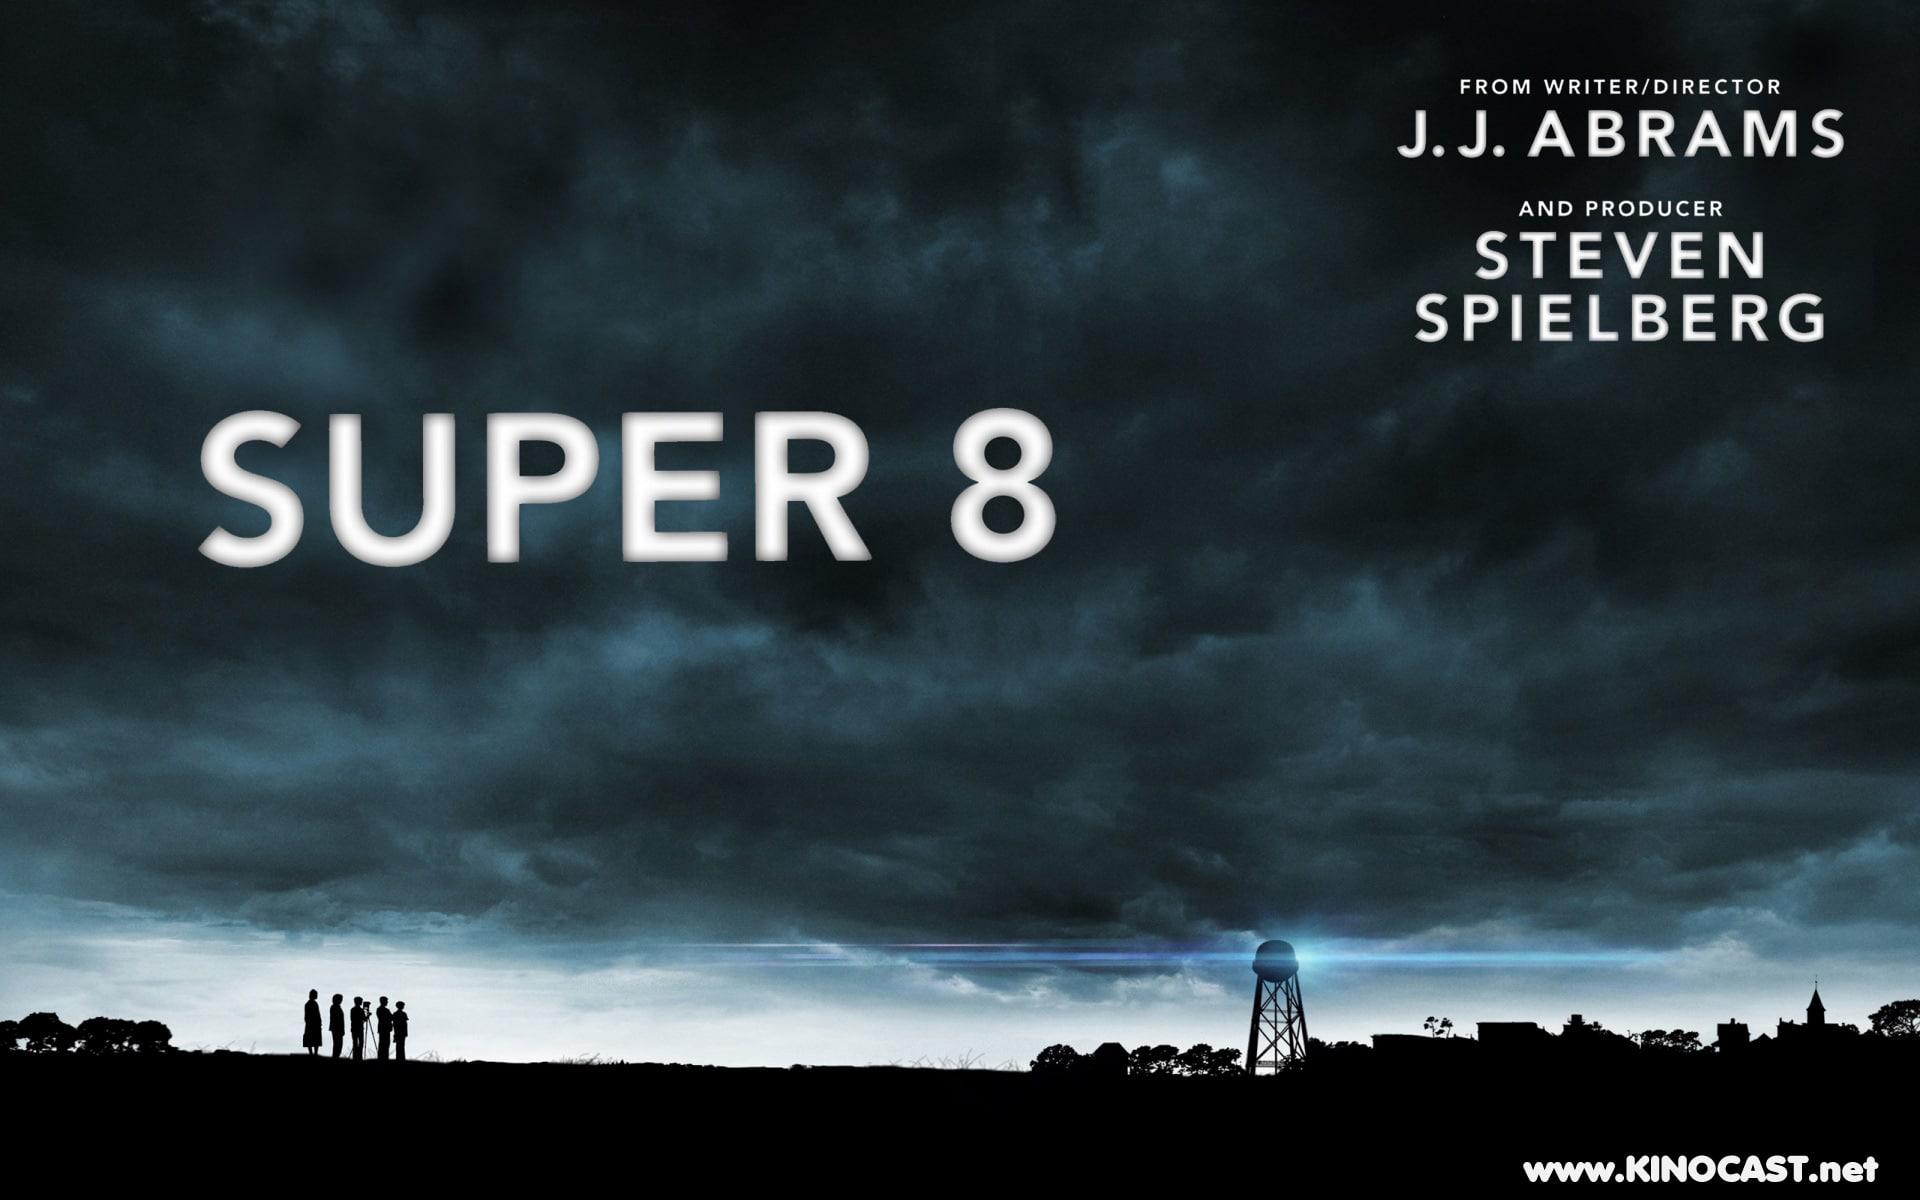 Super 8 Filmposter